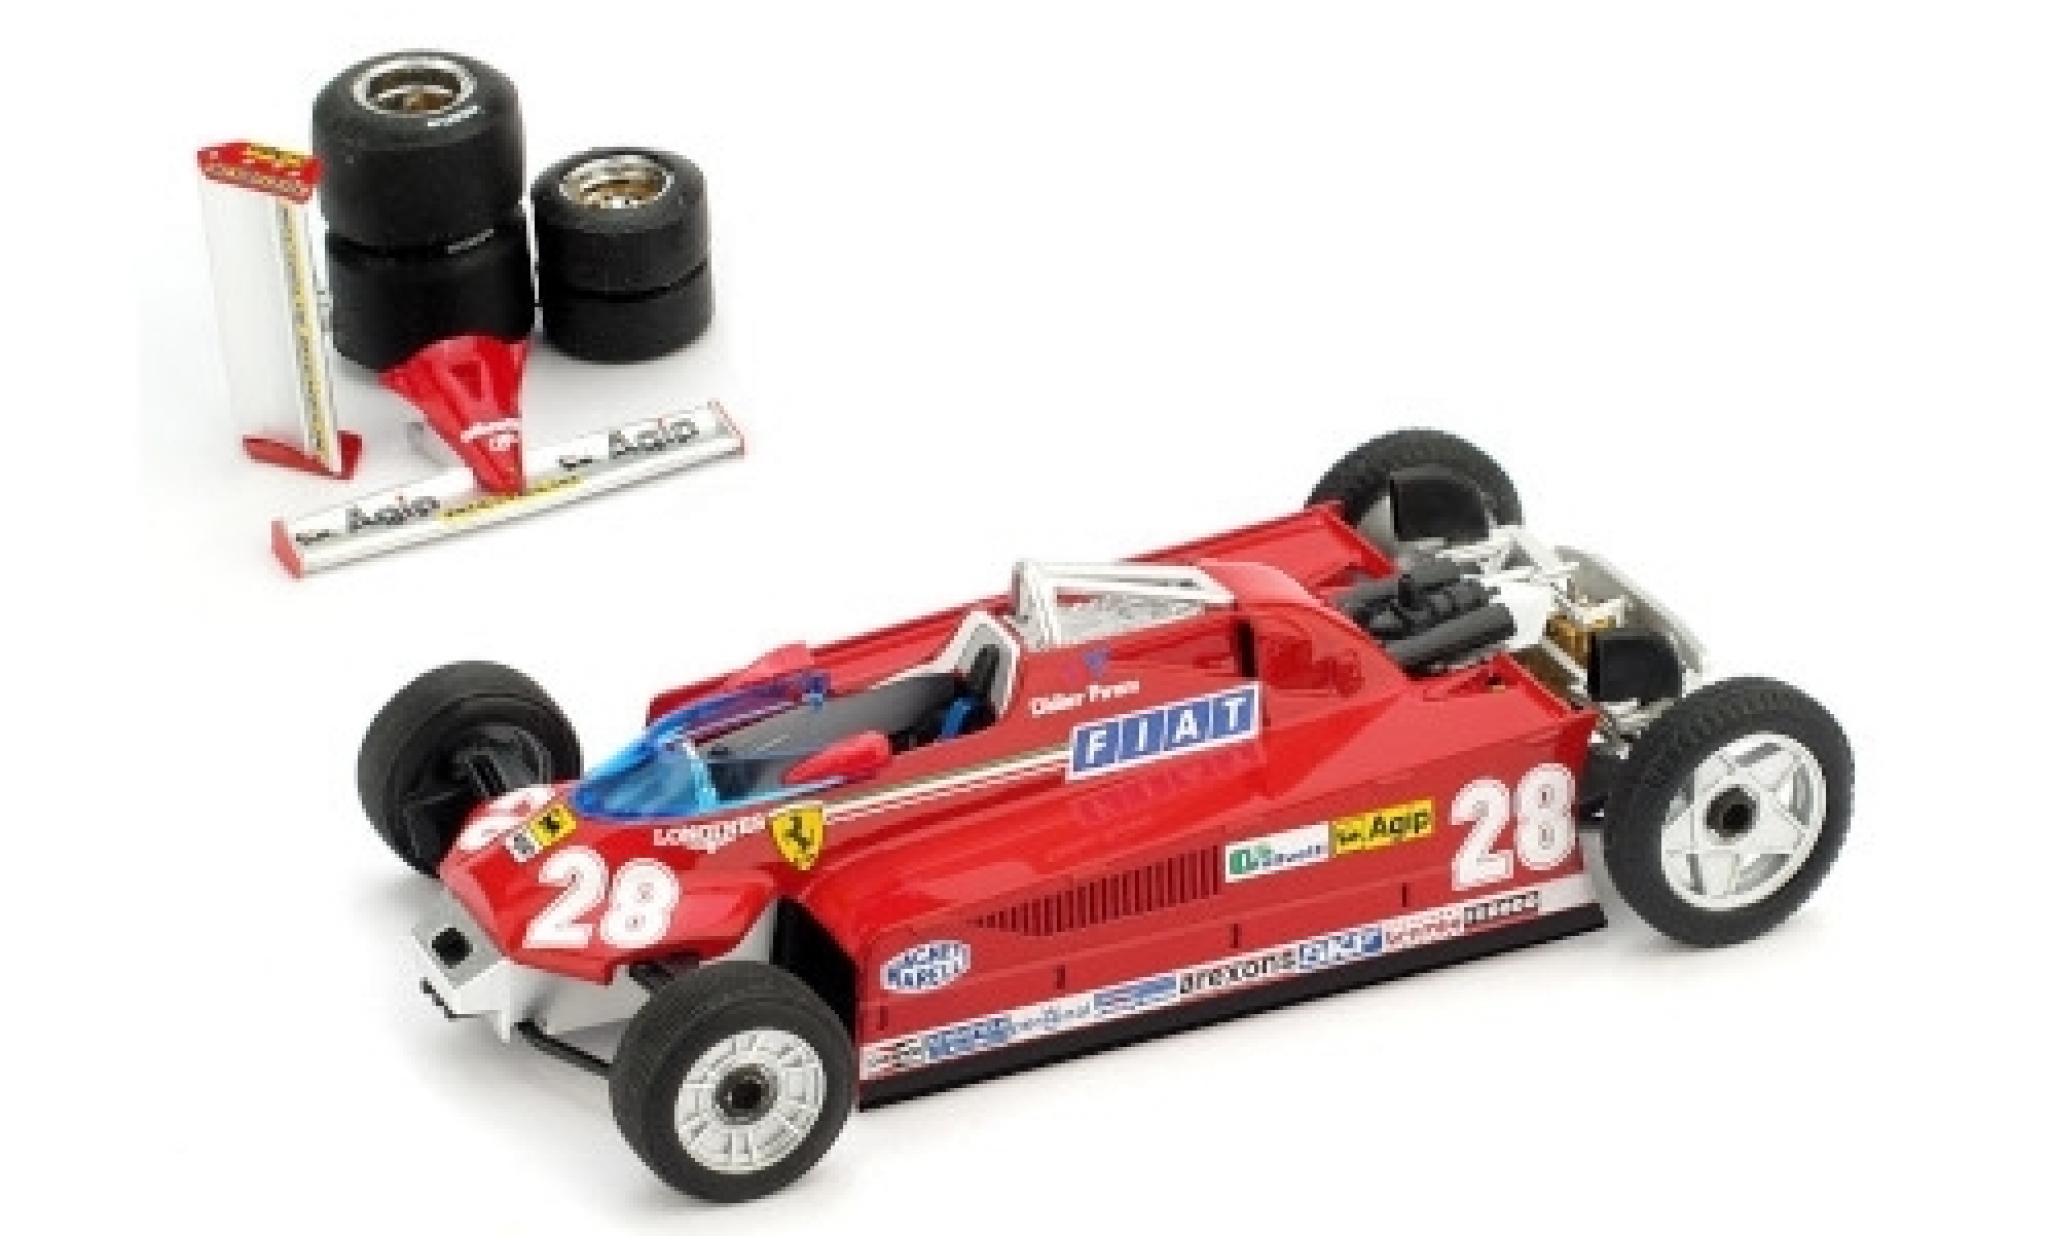 Ferrari 126 1/43 Brumm CK Turbo No.28 Scuderia Formel 1 GP Monaco 1981 Transportversion D.Pironi